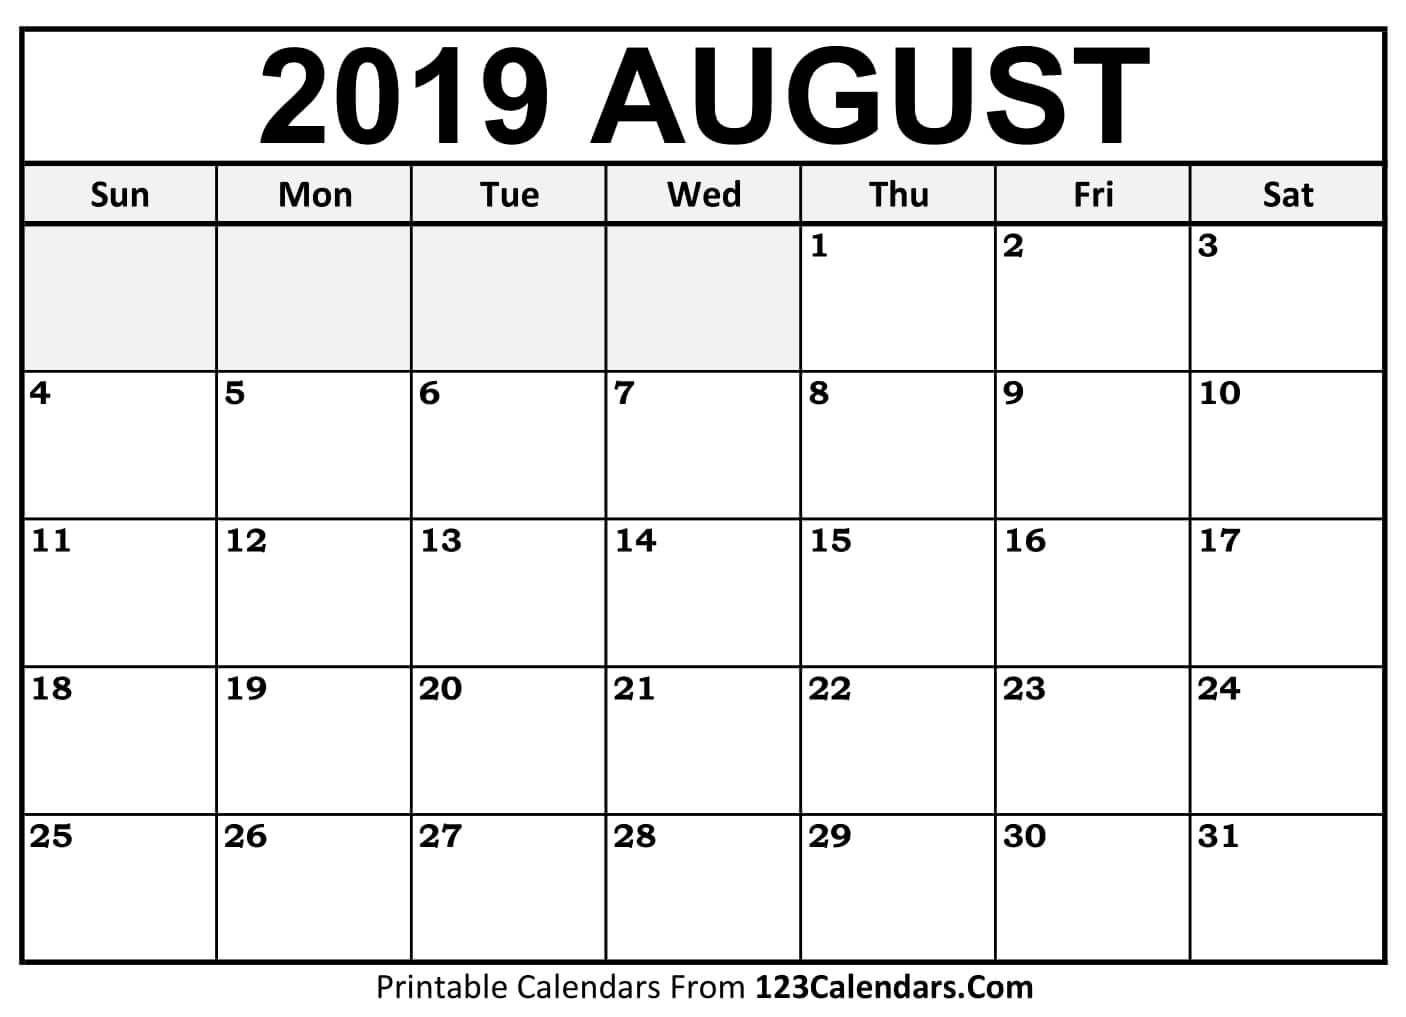 August 2019 Calendar Printable Templates | August 2019 Calendar within Printable Monthly Calendar Template Aug